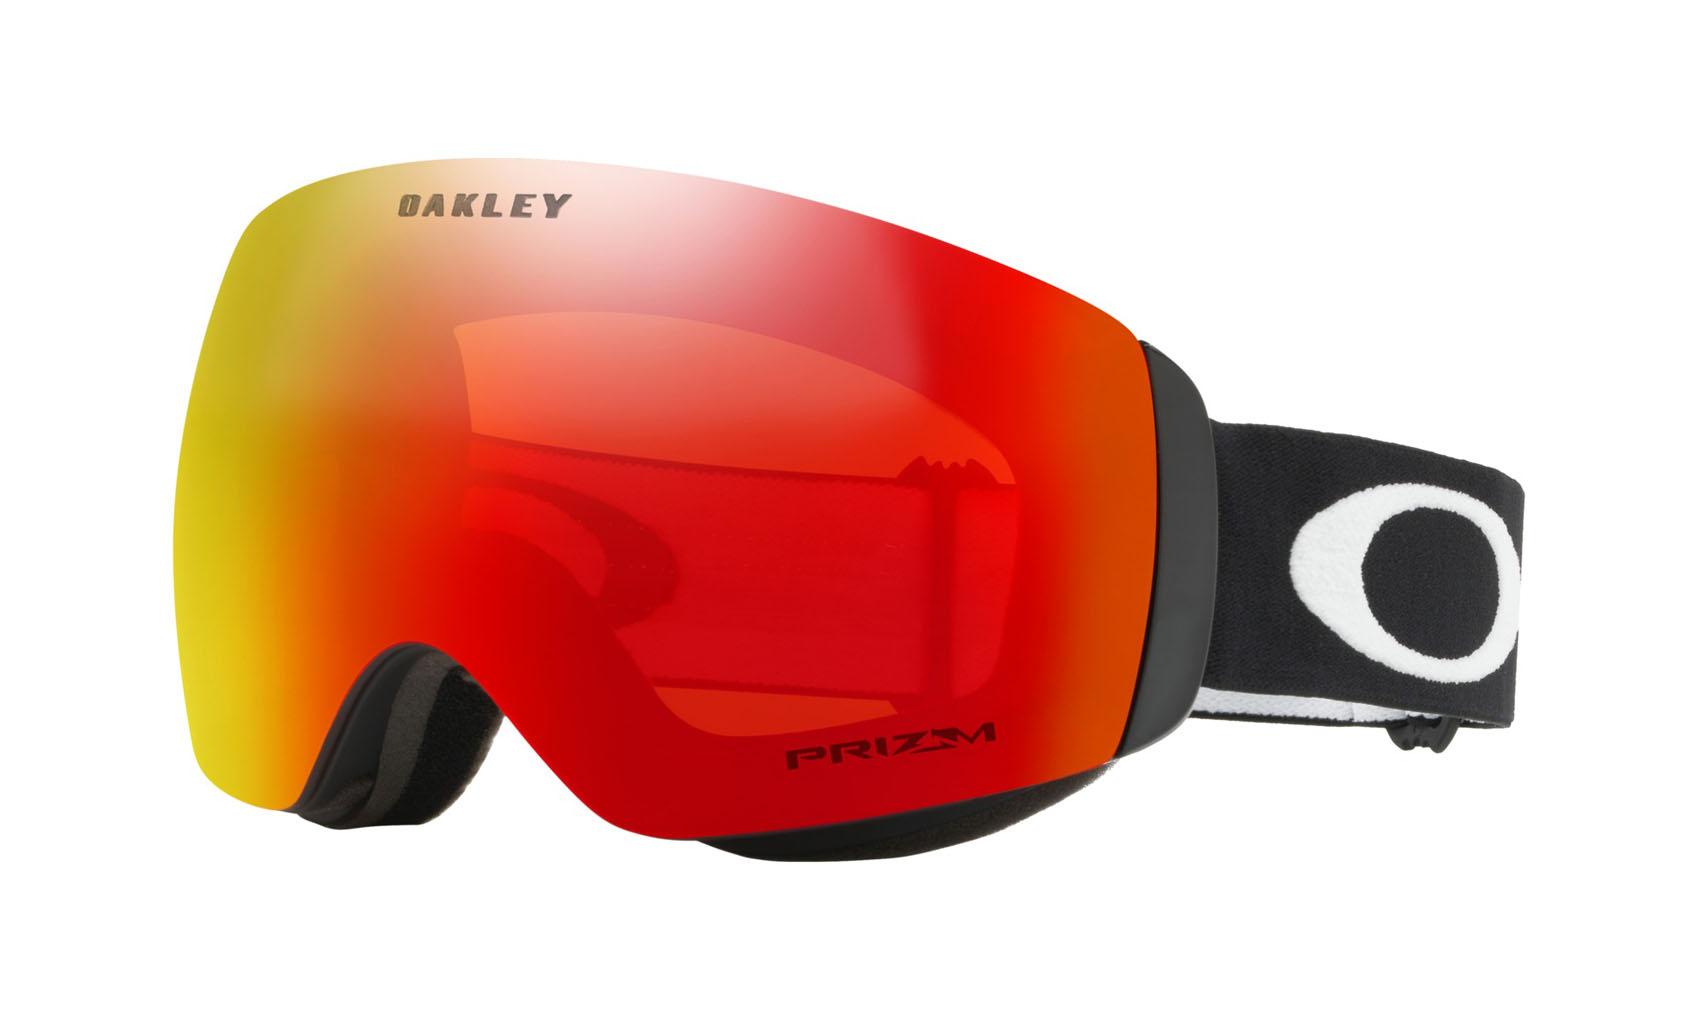 1fae6dde33 Sentinel Oakley Snowboard Goggles - Flight Deck XM - Matte Black